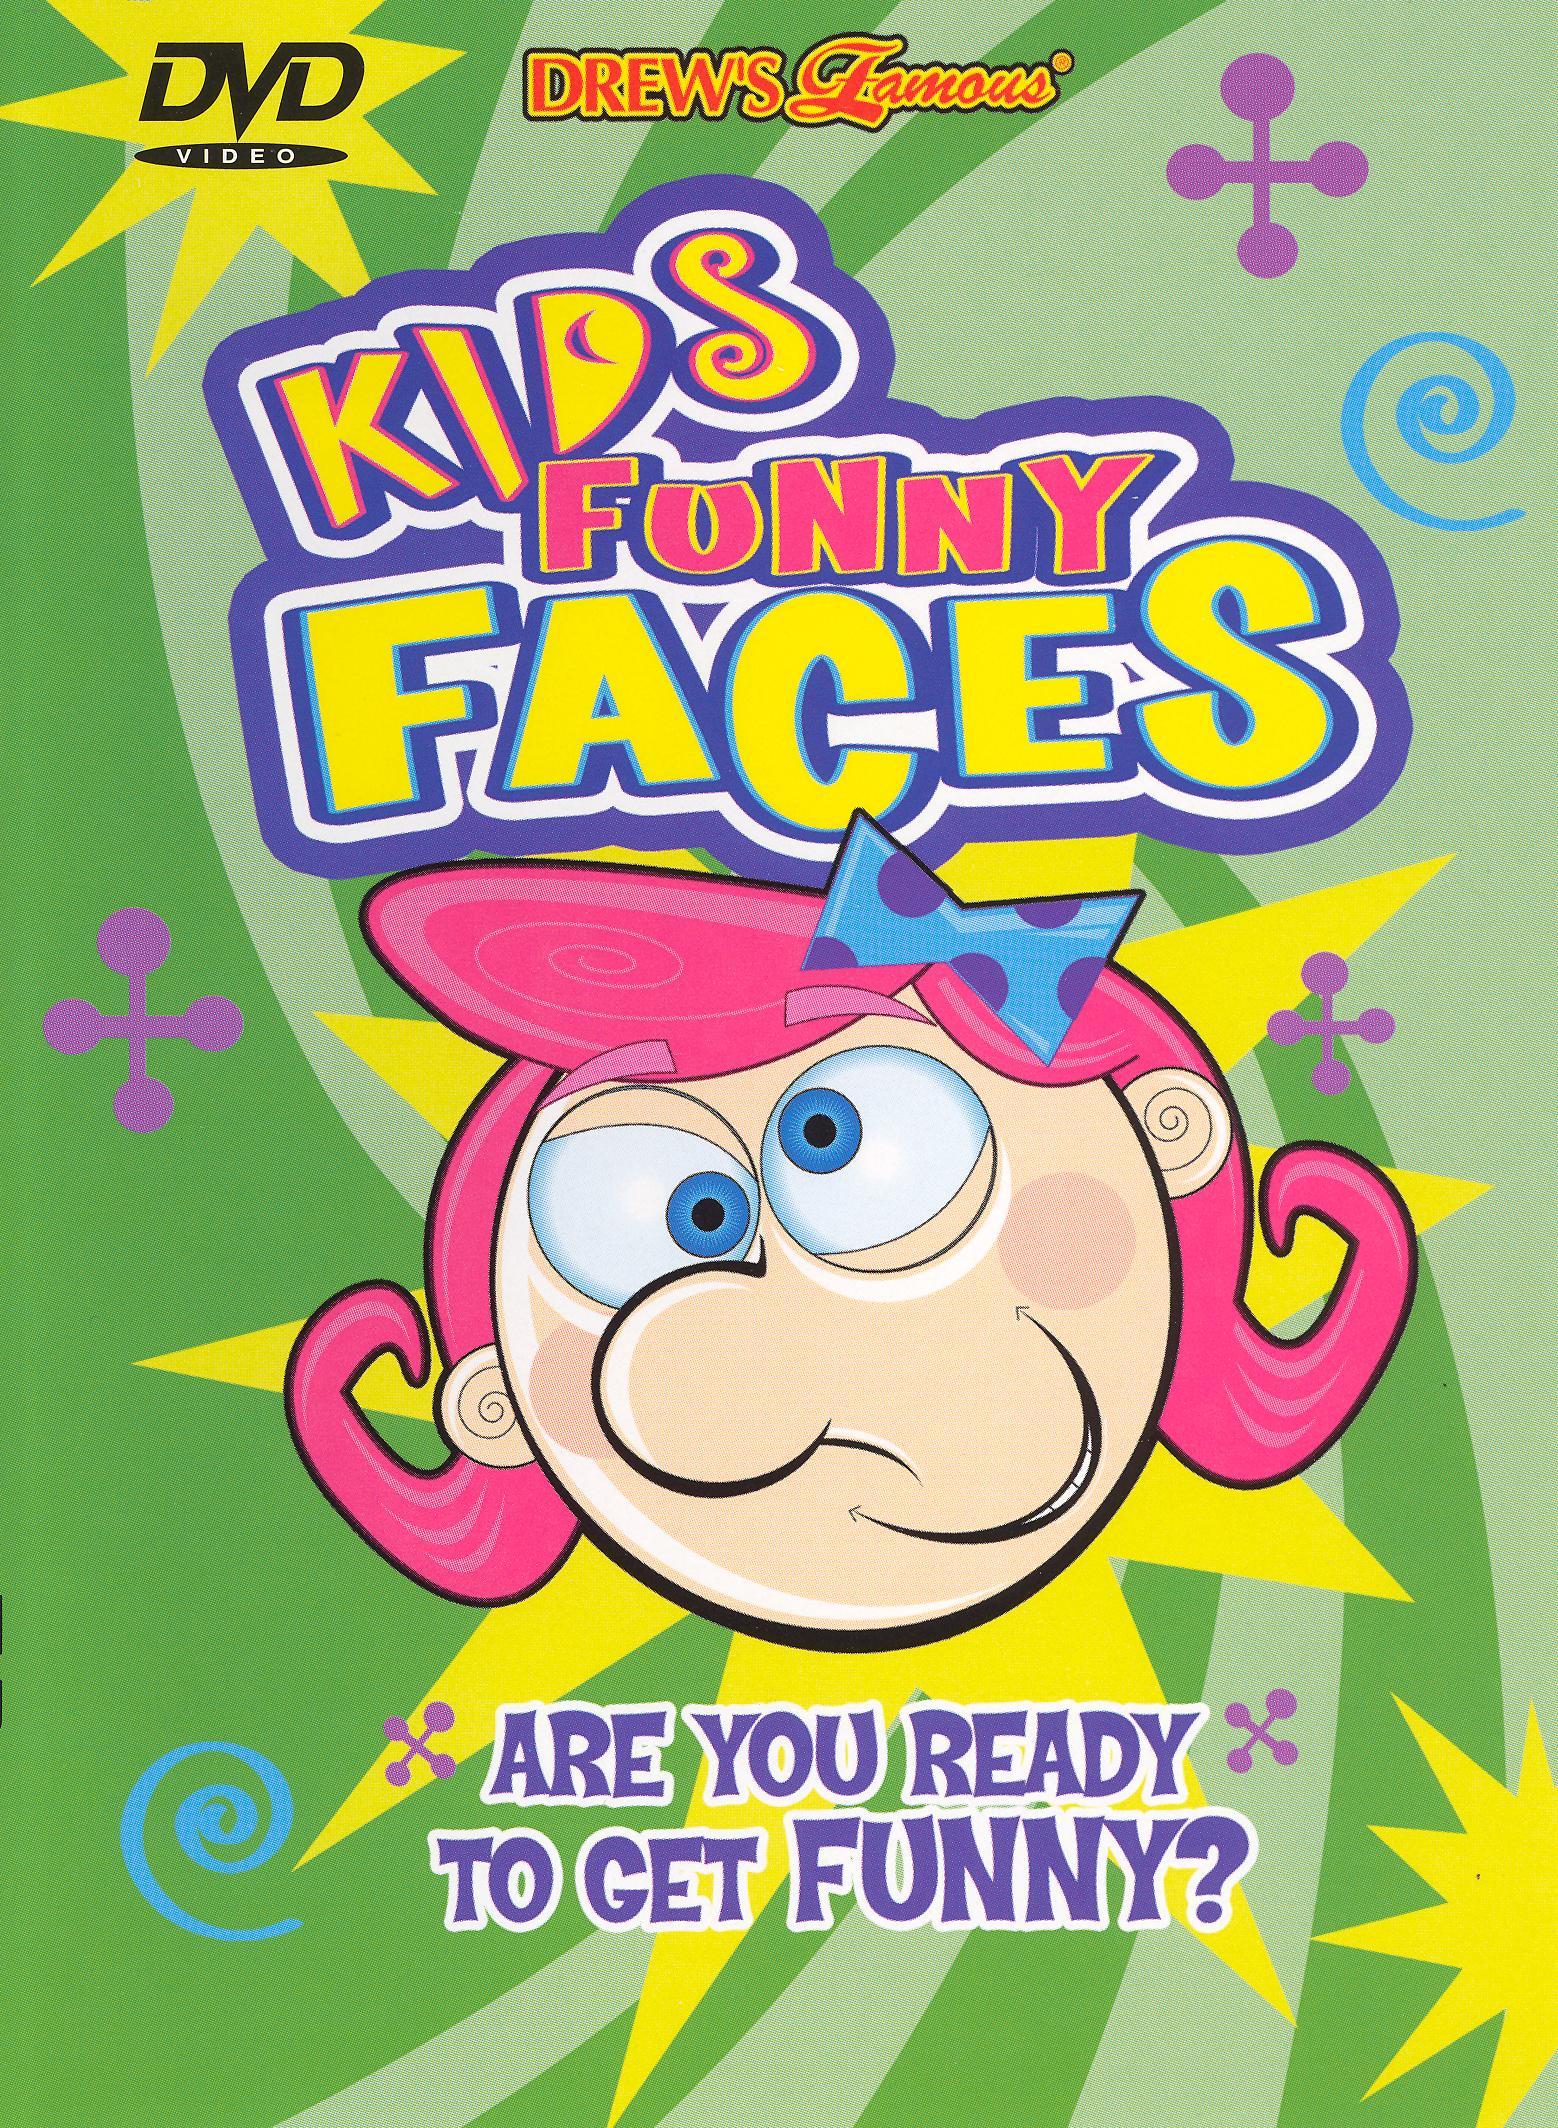 Drew's Famous Kids Funny Faces